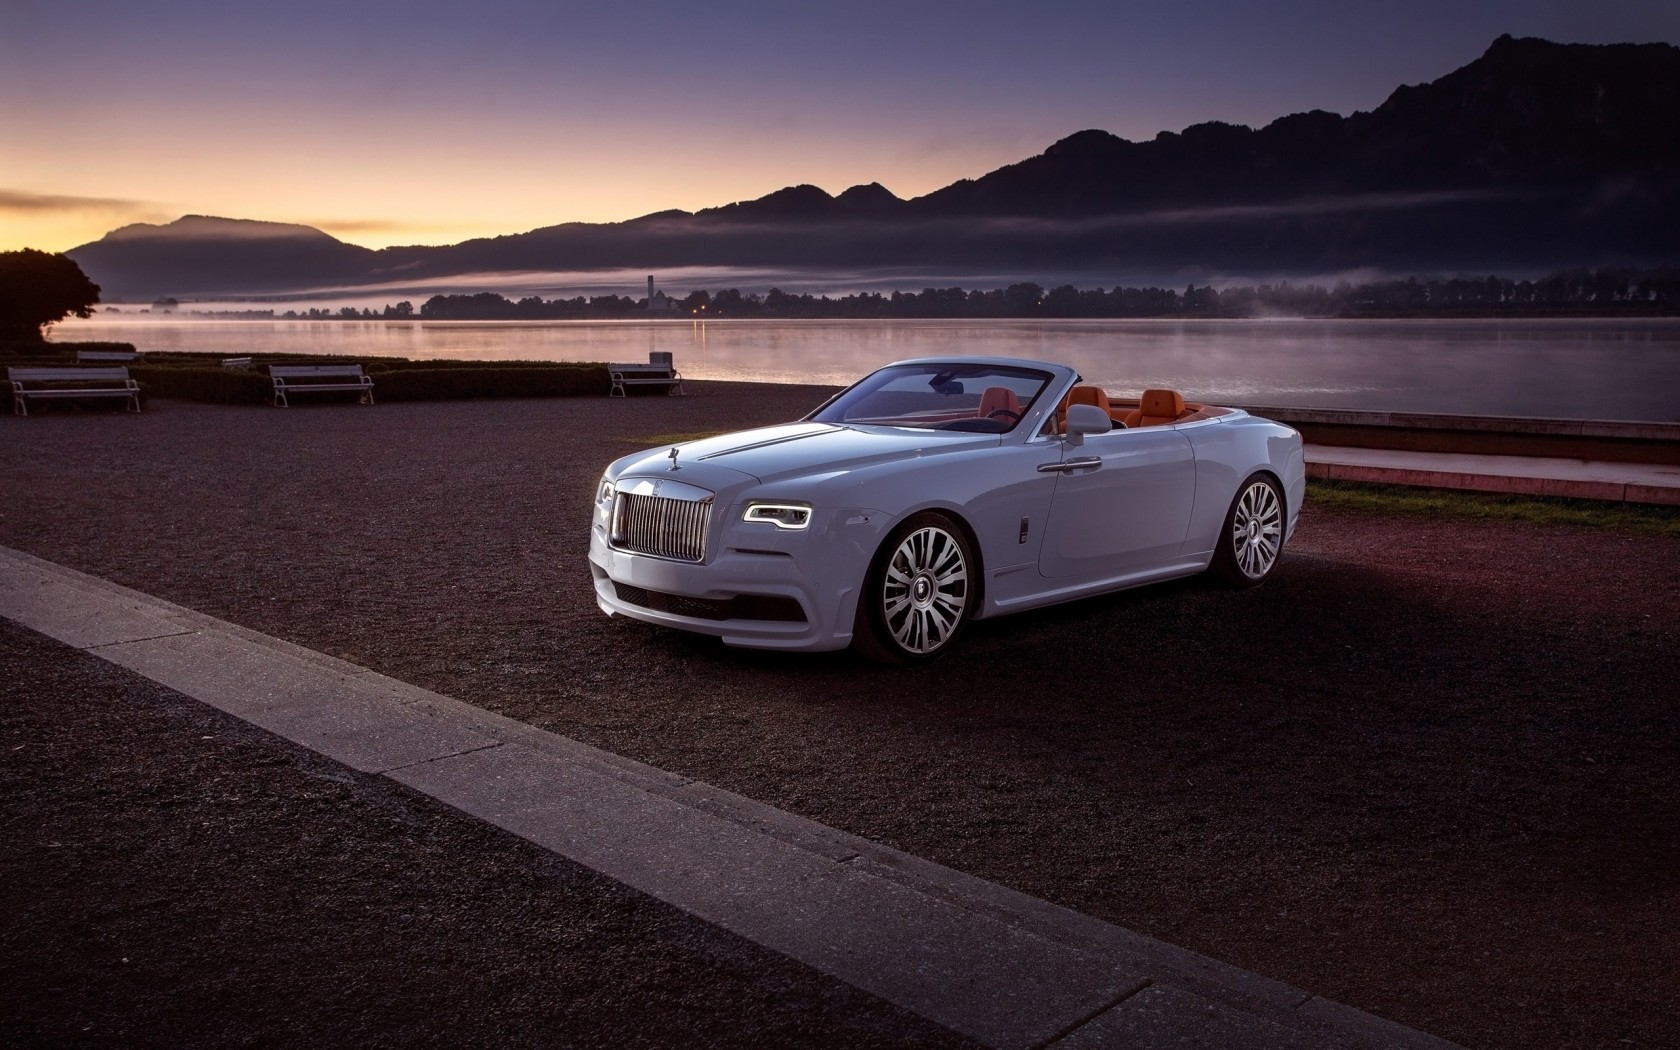 2016 spofec rolls royce dawn 3 wallpaper hd car - Rolls royce wallpaper download ...